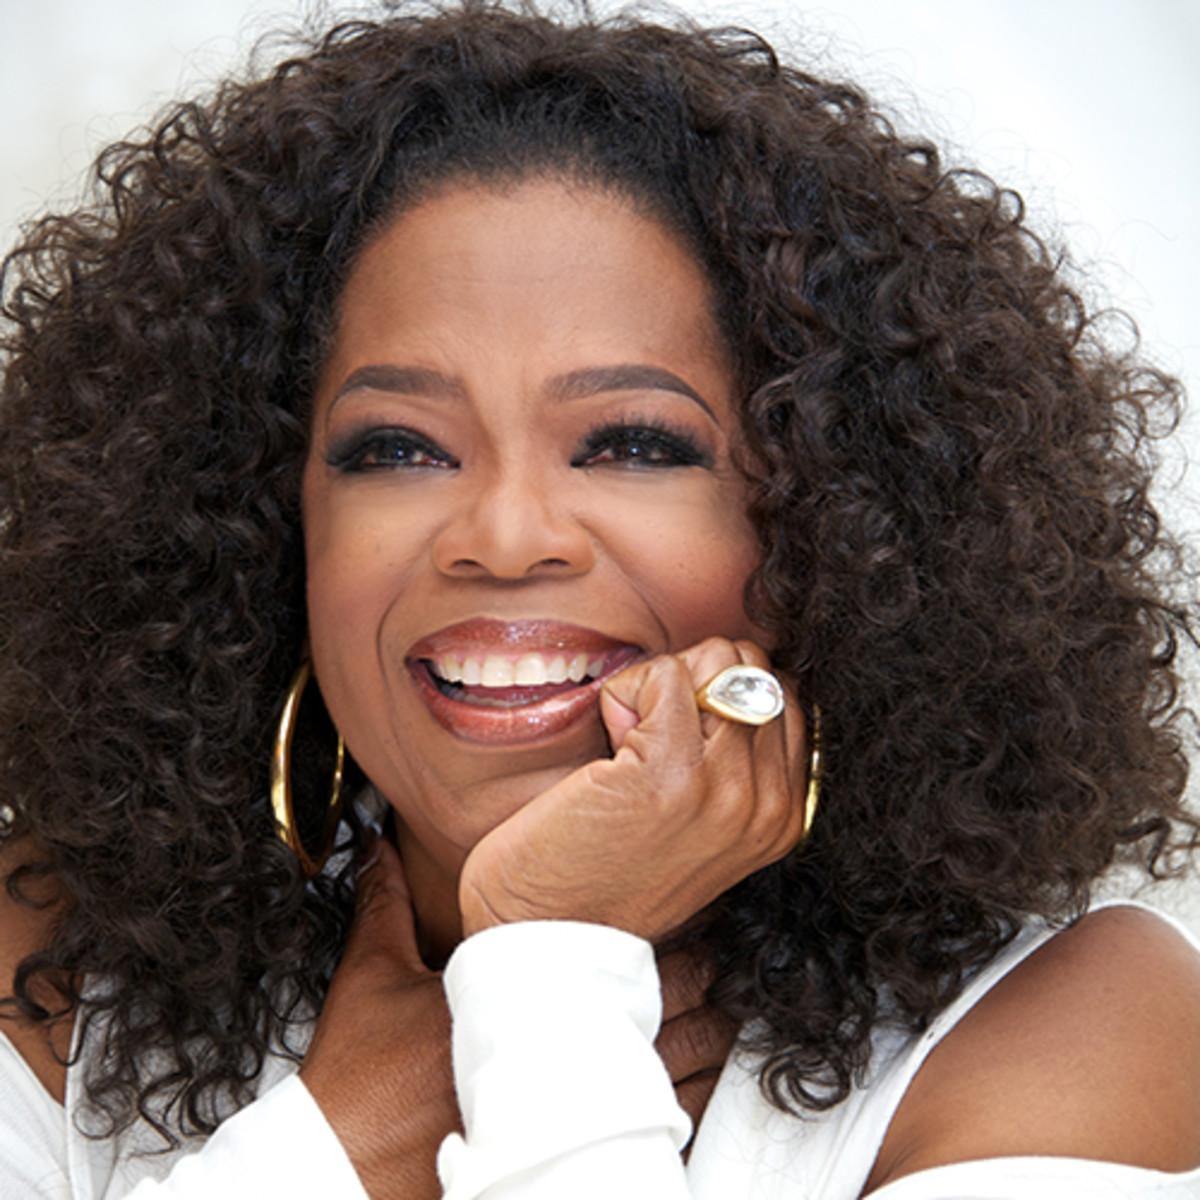 American Billionaire, Oprah Winfrey gifts Nigerian teenager a brand new iPhone 11